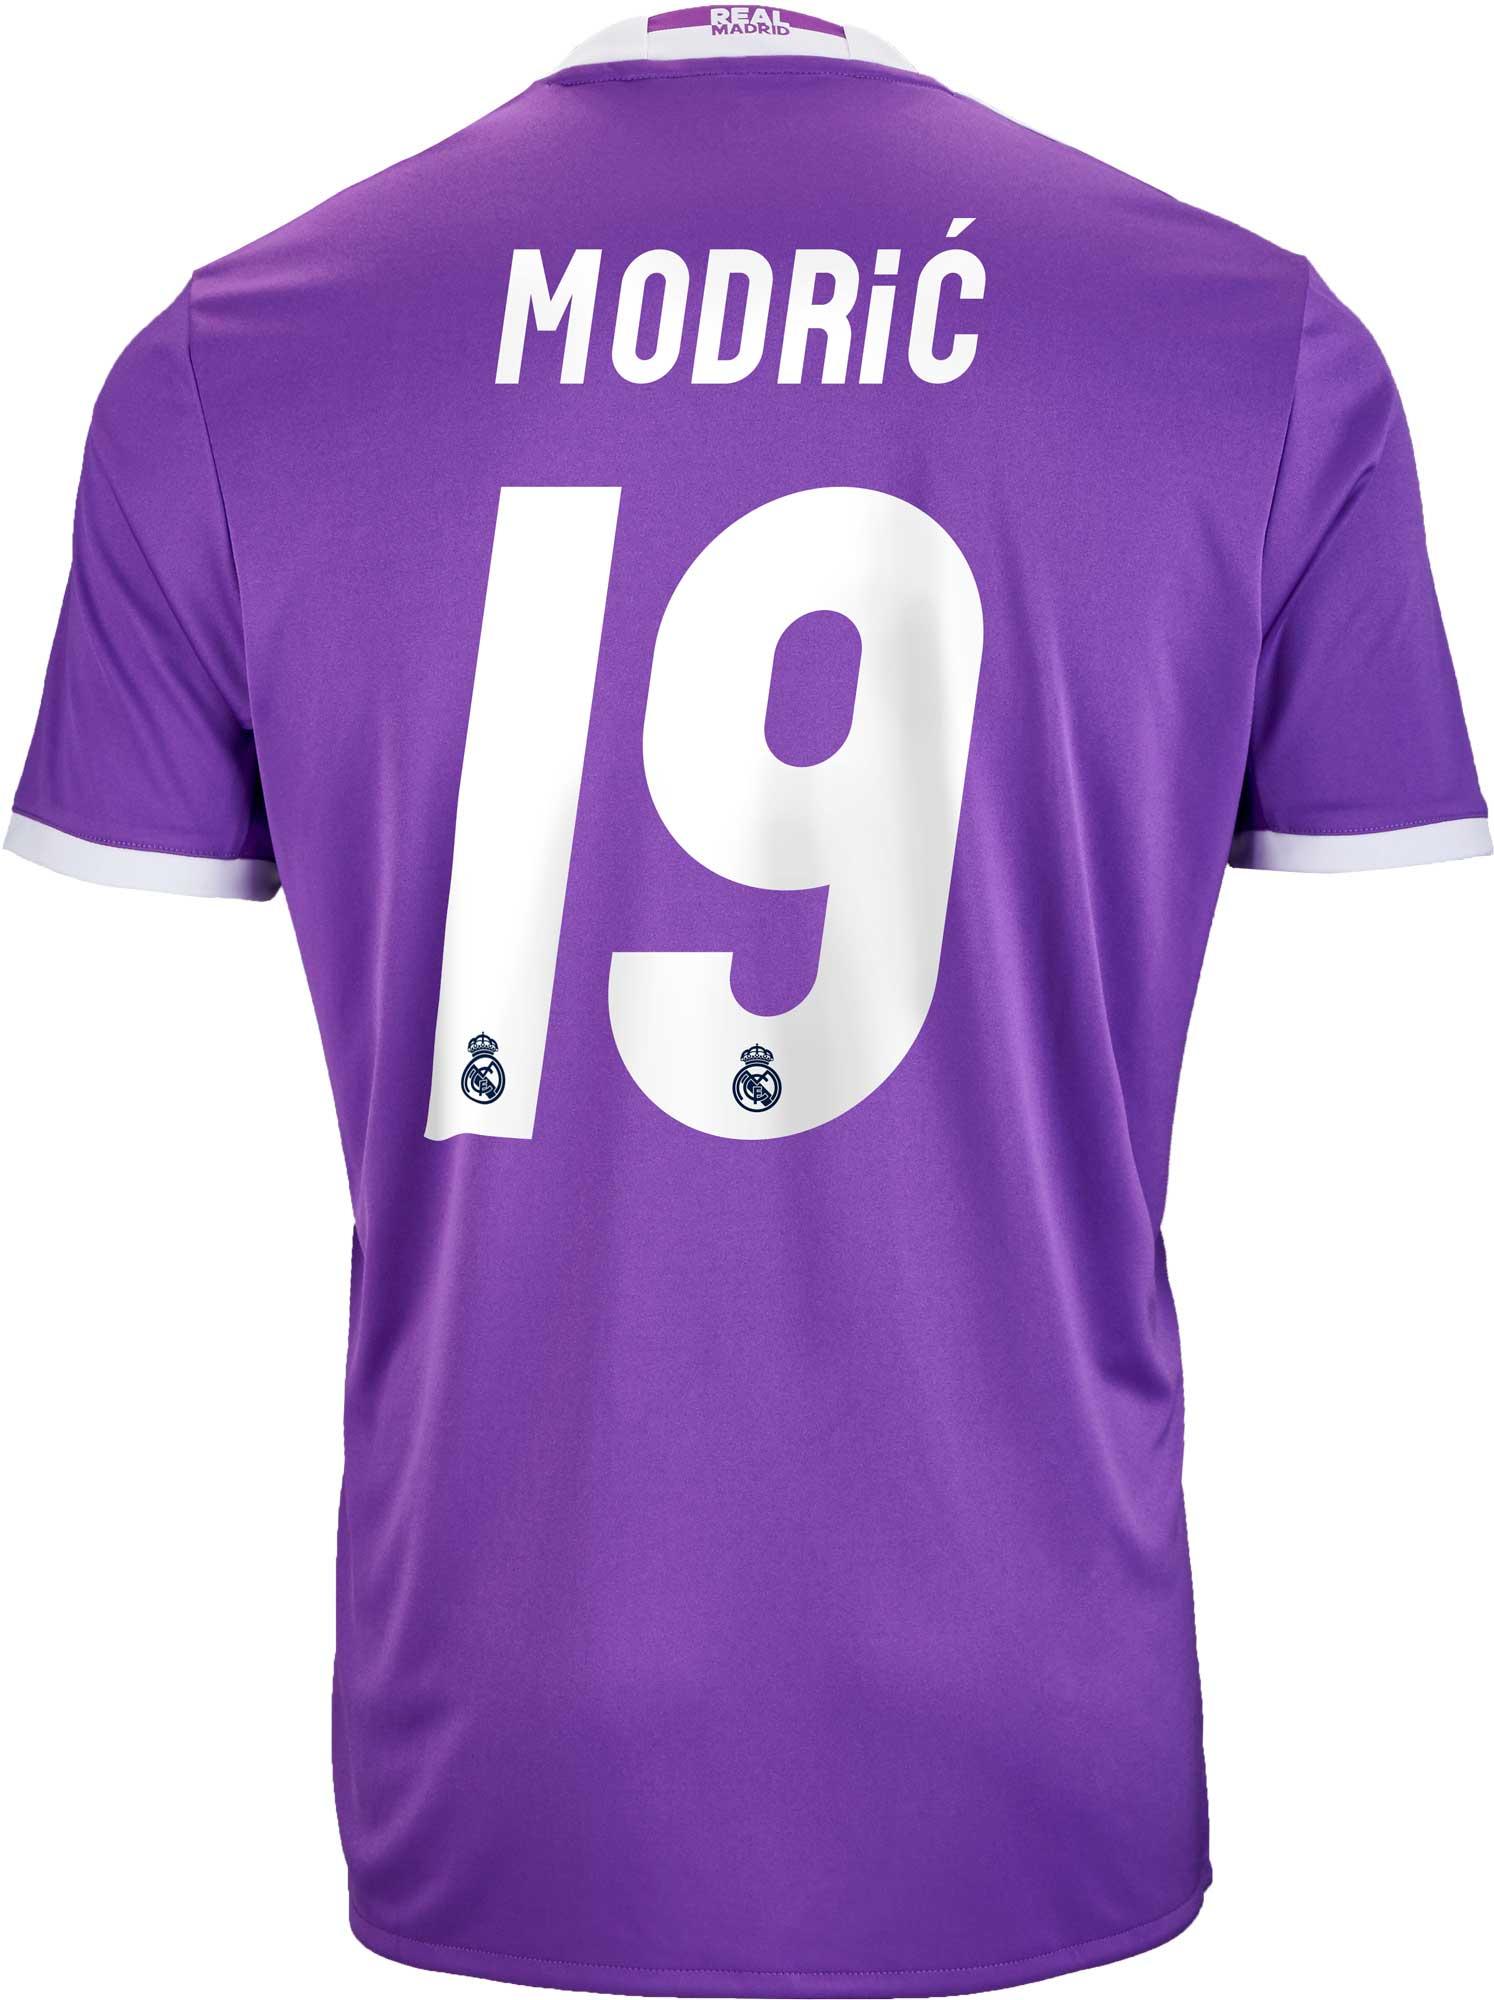 100% authentic e0b7c d53a4 adidas Luka Modric Real Madrid Jersey - 2016 Real Madrid Jerseys